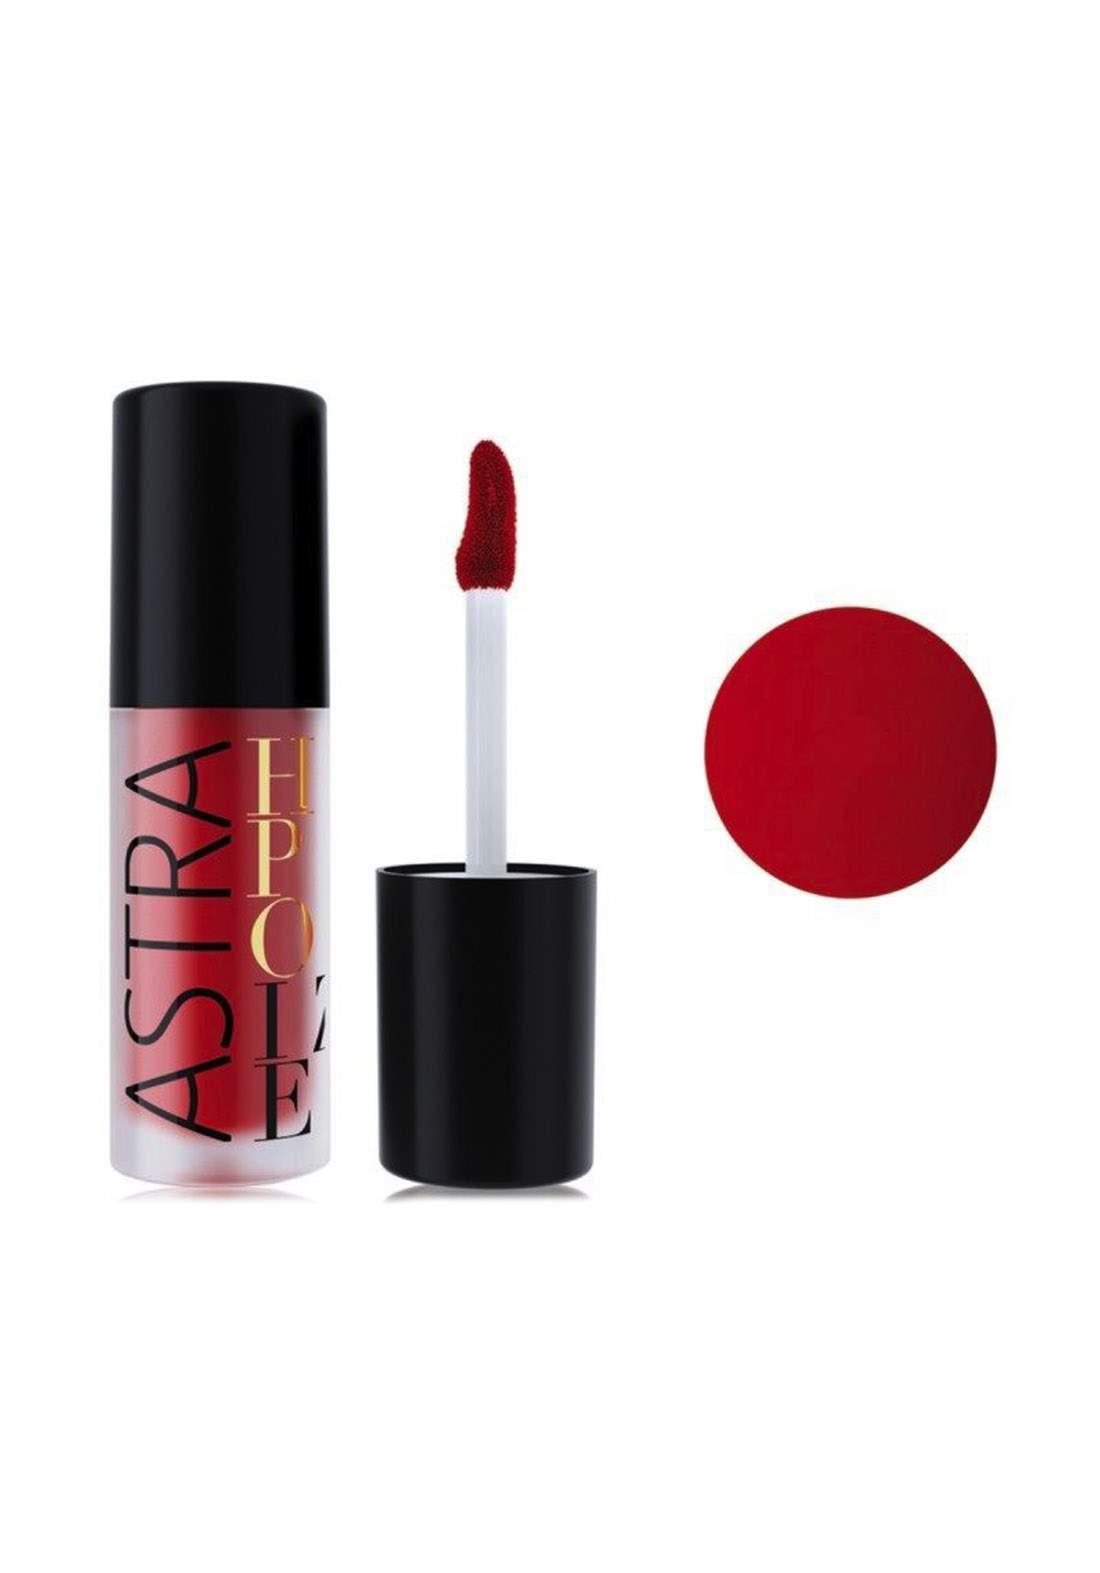 Astra Hypnotize Liquid Lipstick - Lipstick Diva 04 Mat أحمر شفاه